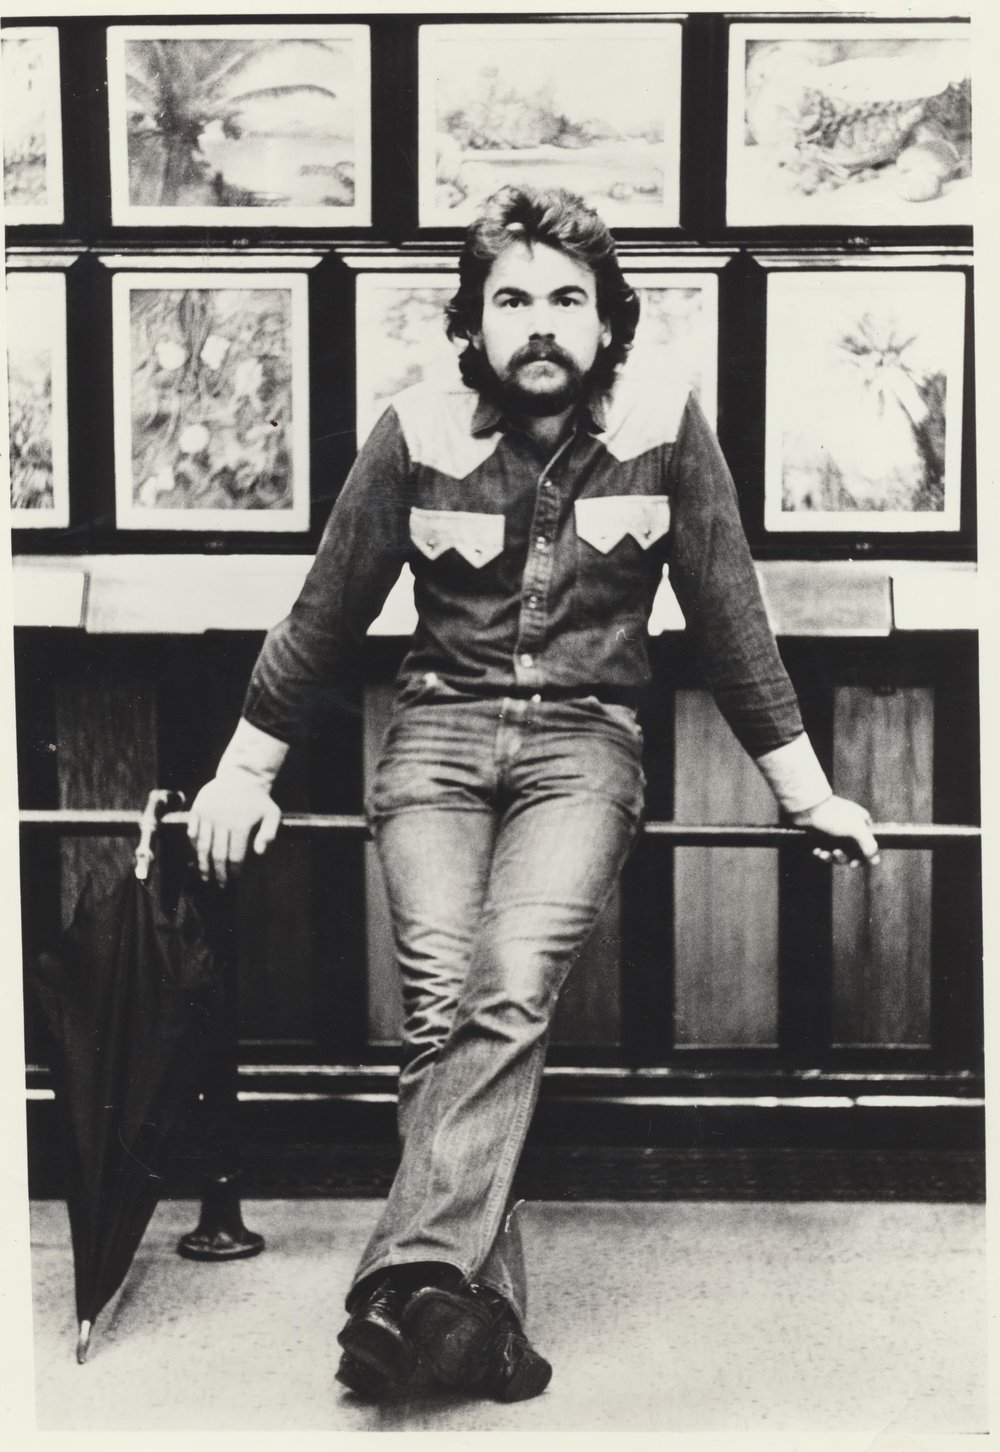 9f 1974 London3.jpg